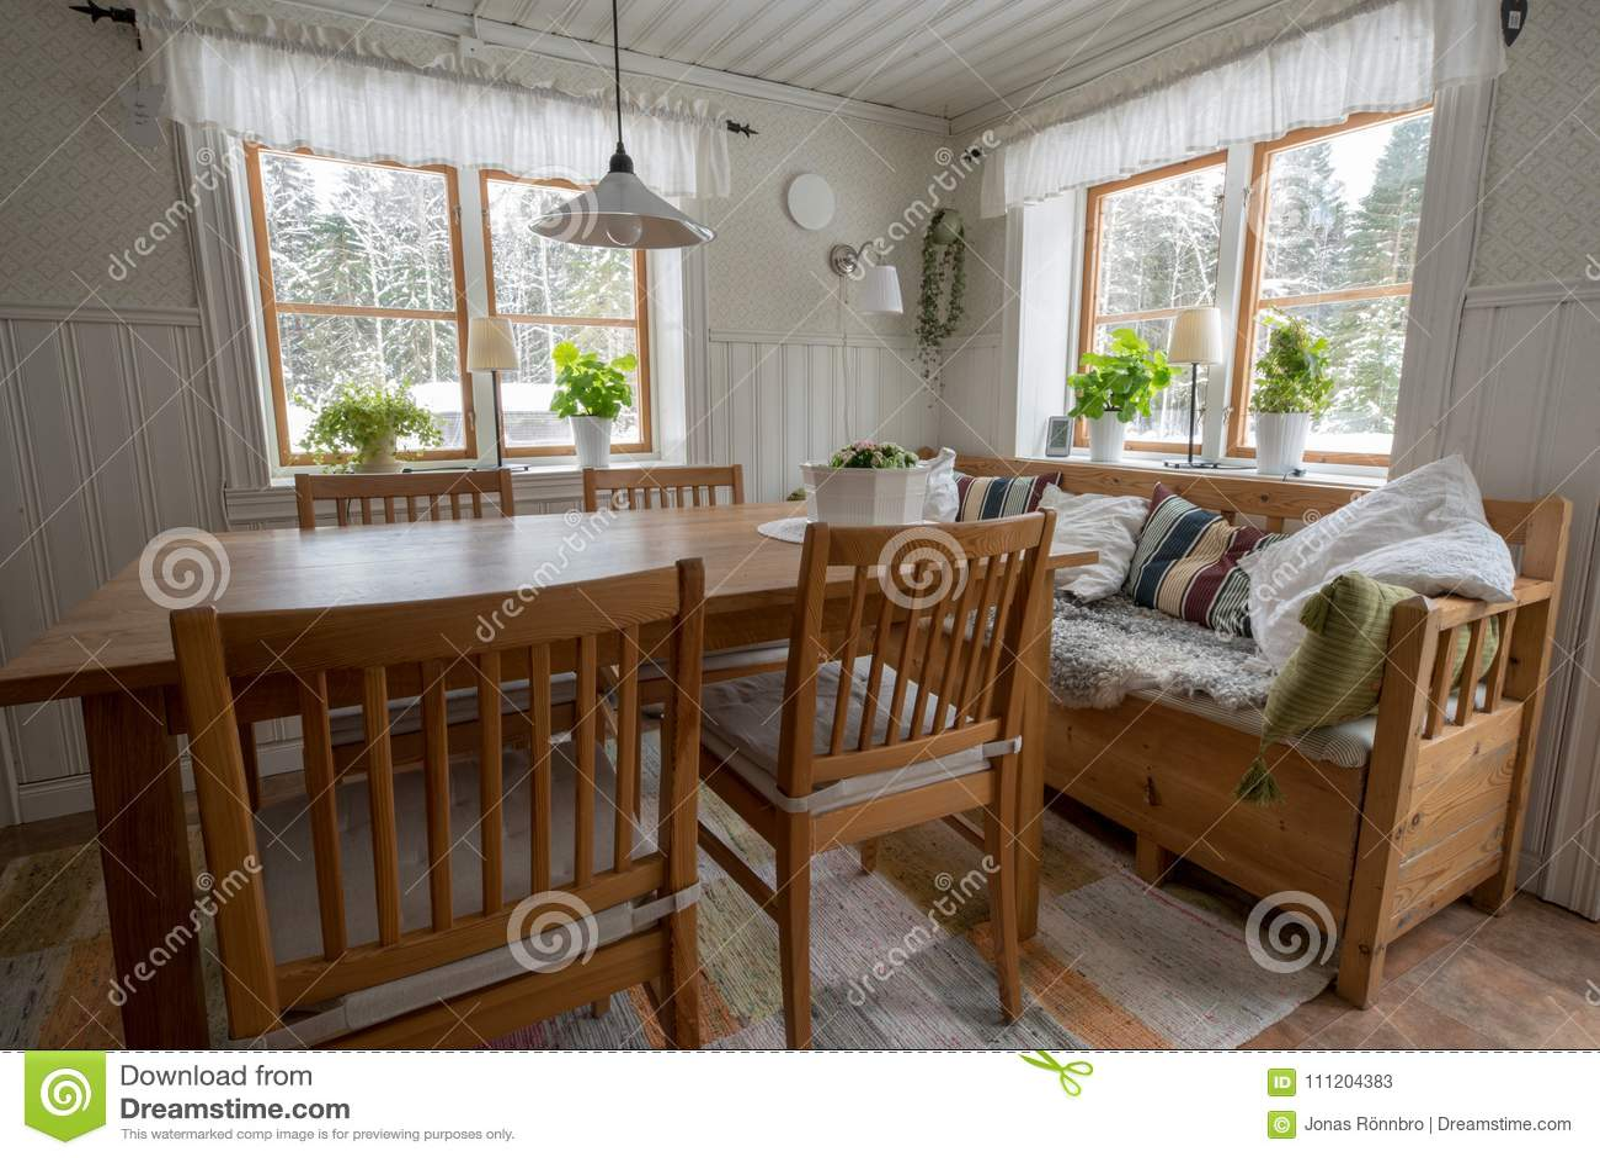 kitchen curtains for sale orange appliances 老乡村模式的厨房在有桌椅子和沙发的瑞典库存图片 图片包括有瑞典语 老乡村模式的厨房在有桌椅子和沙发的瑞典